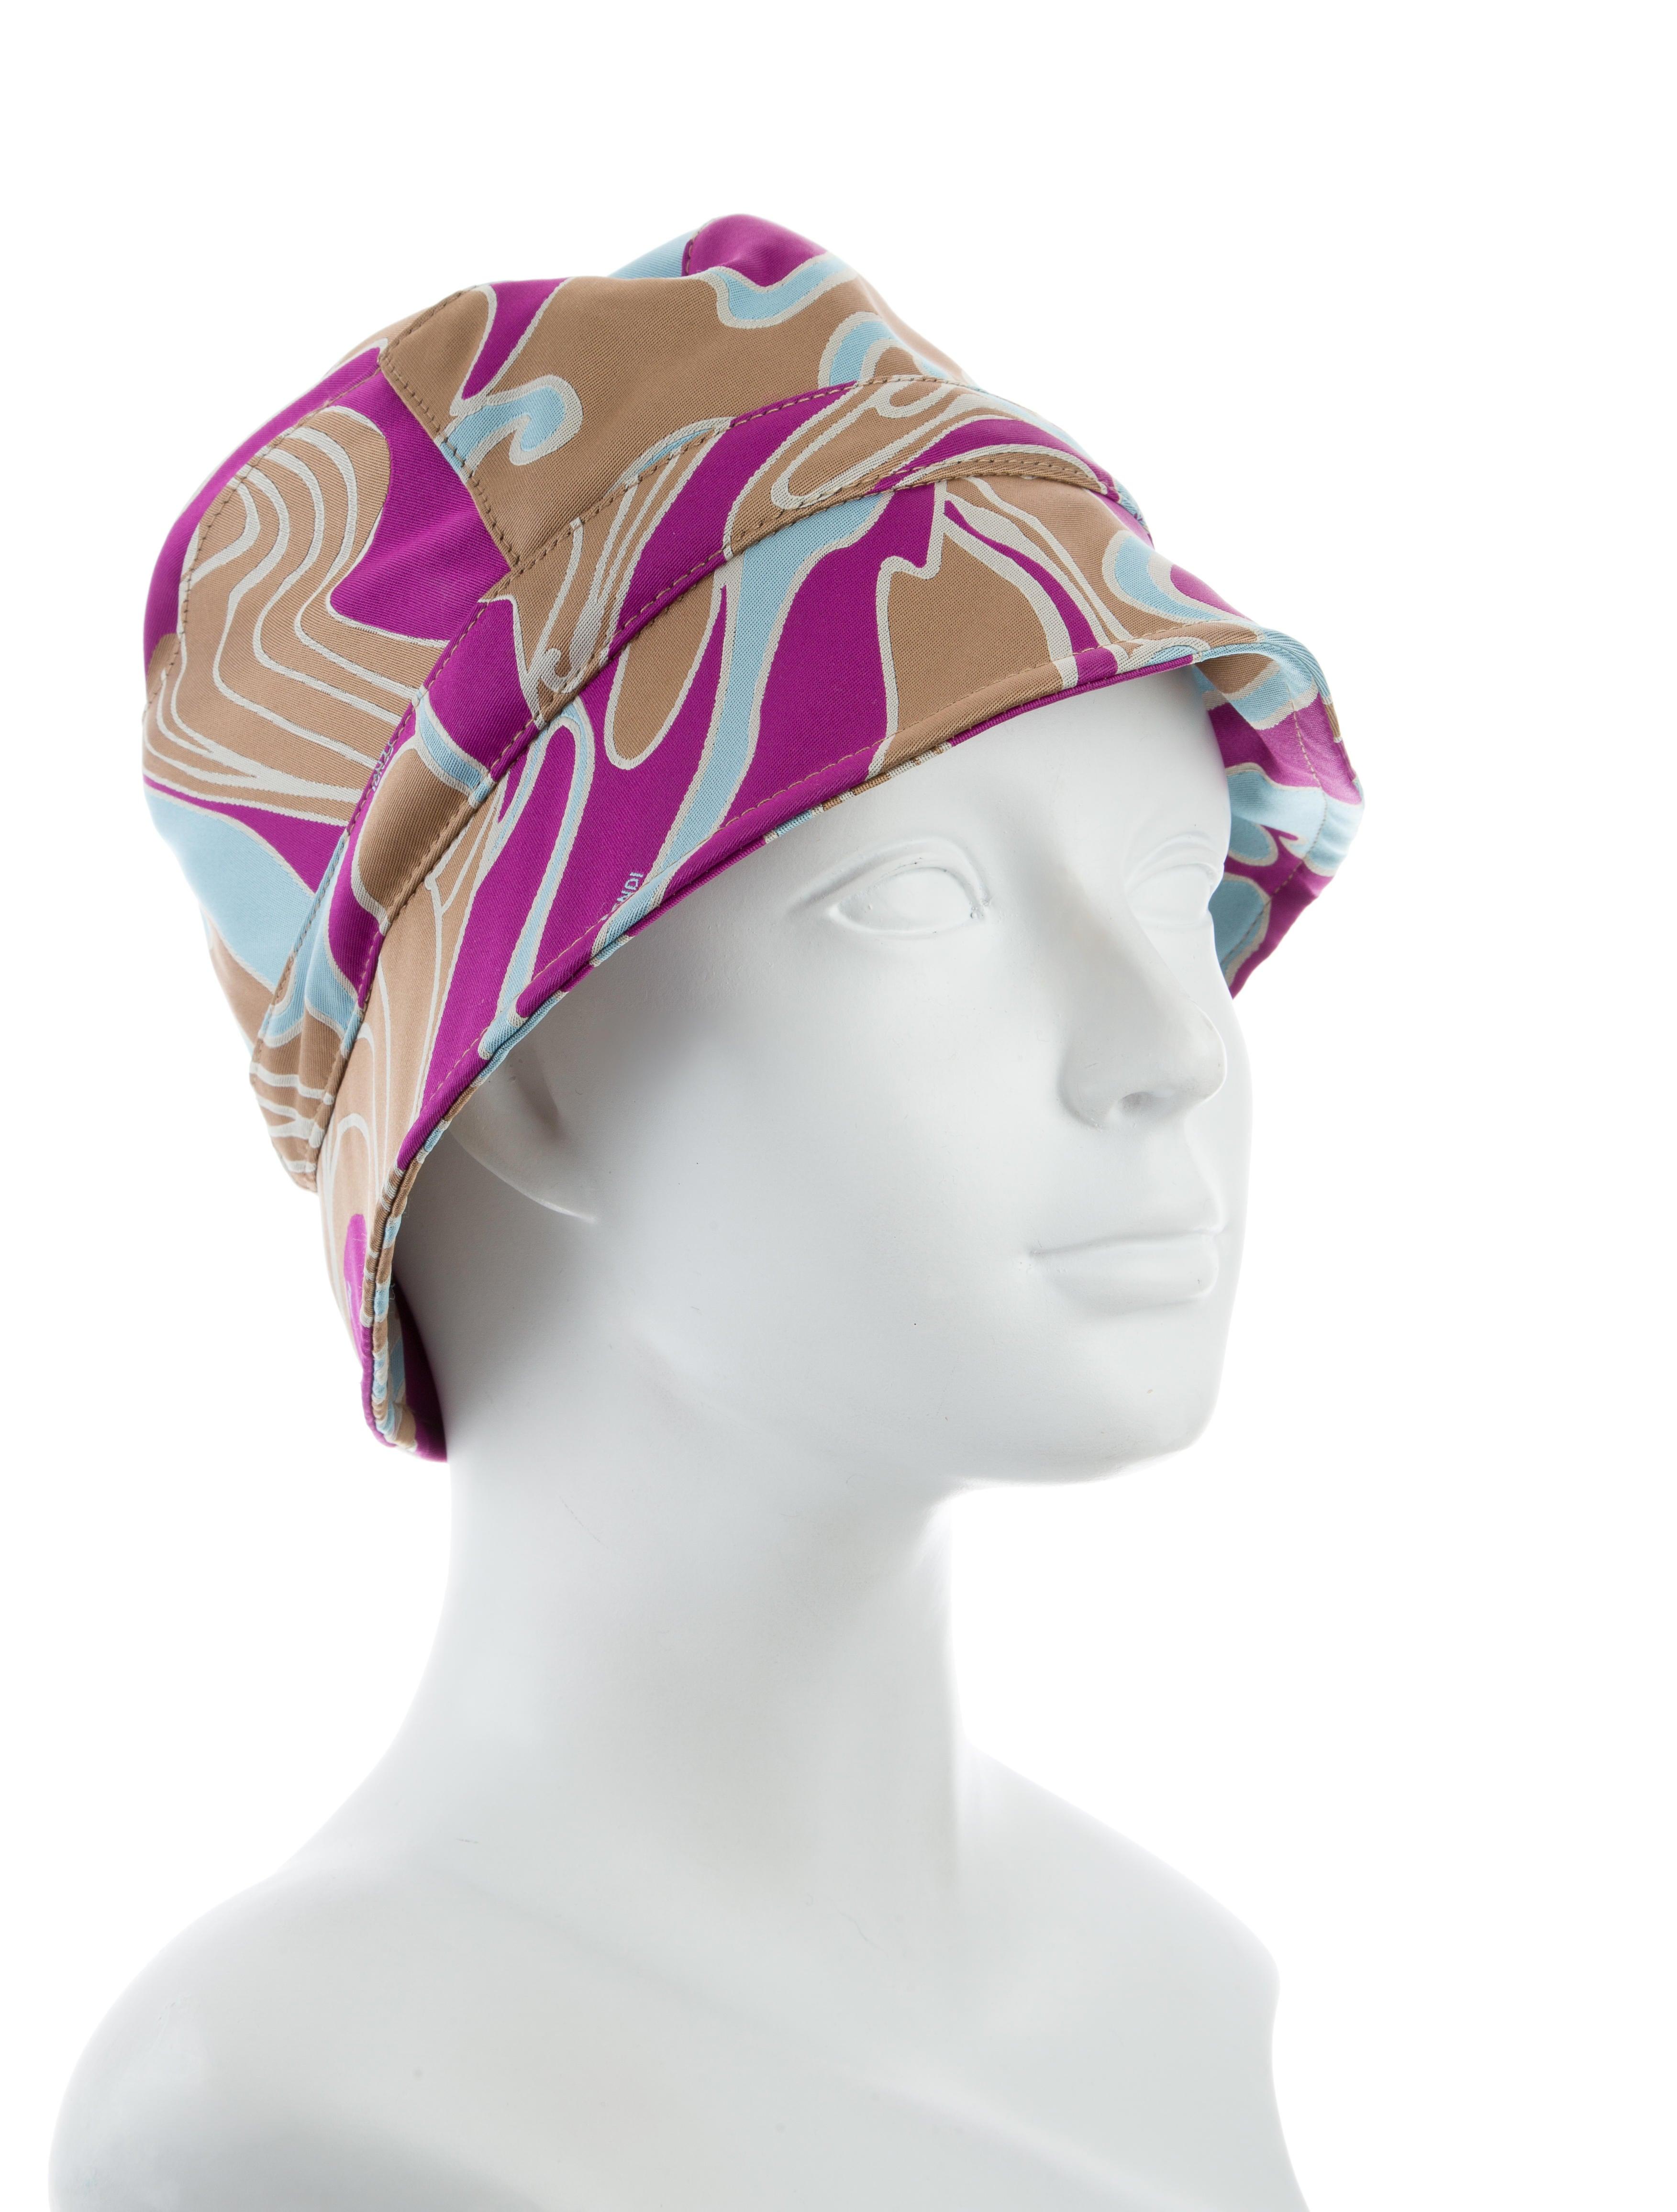 Fendi Patterned Bucket Hat w/ Tags - Accessories ...